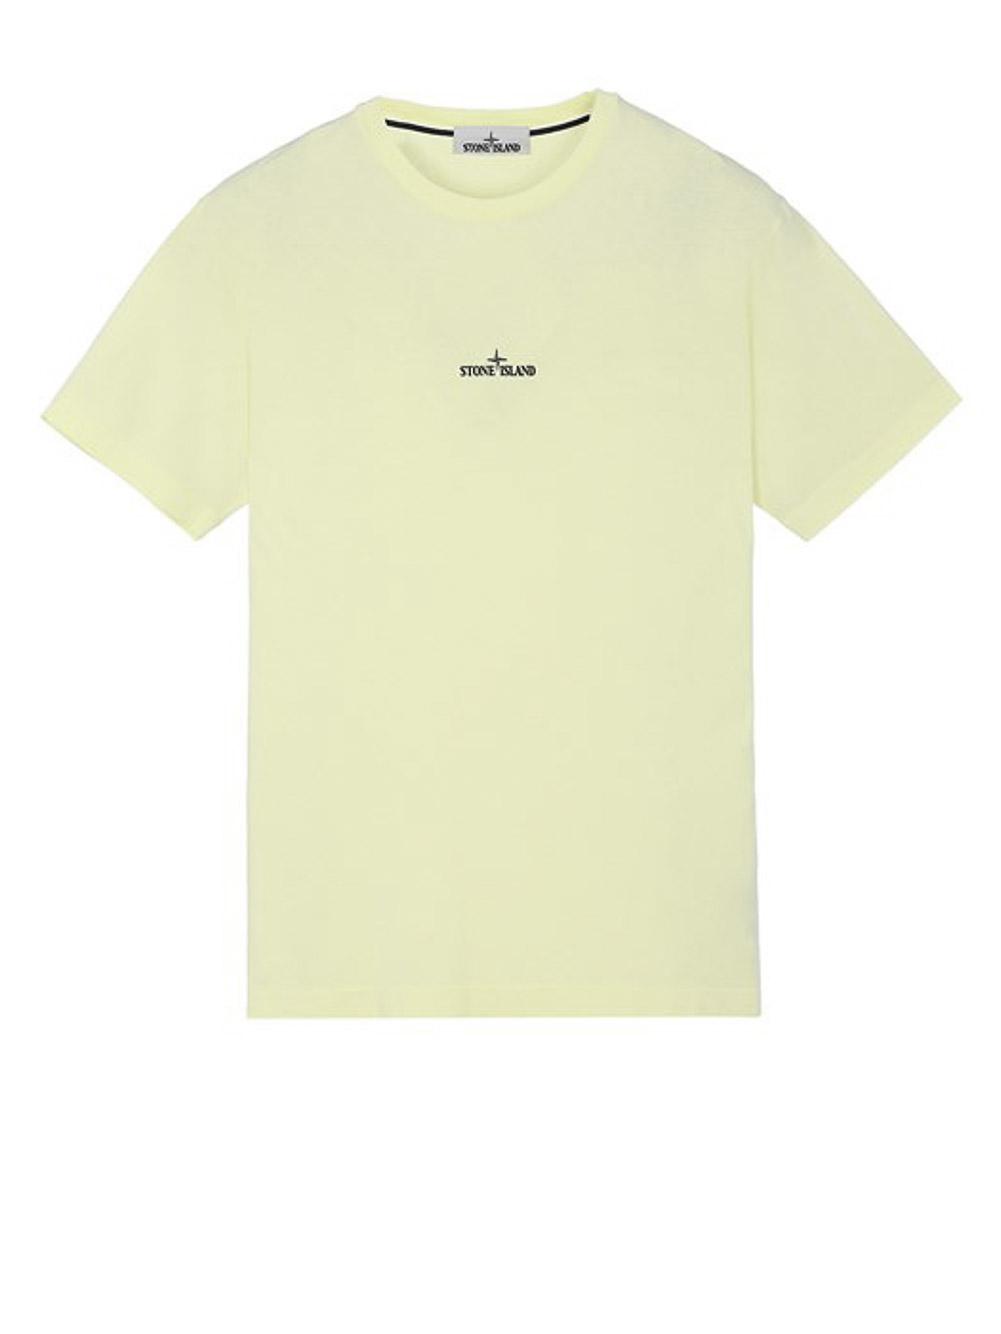 STONE ISLAND Μπλούζα T-Shirt MO74152NS85-V0031 ΚΙΤΡΙΝΟ